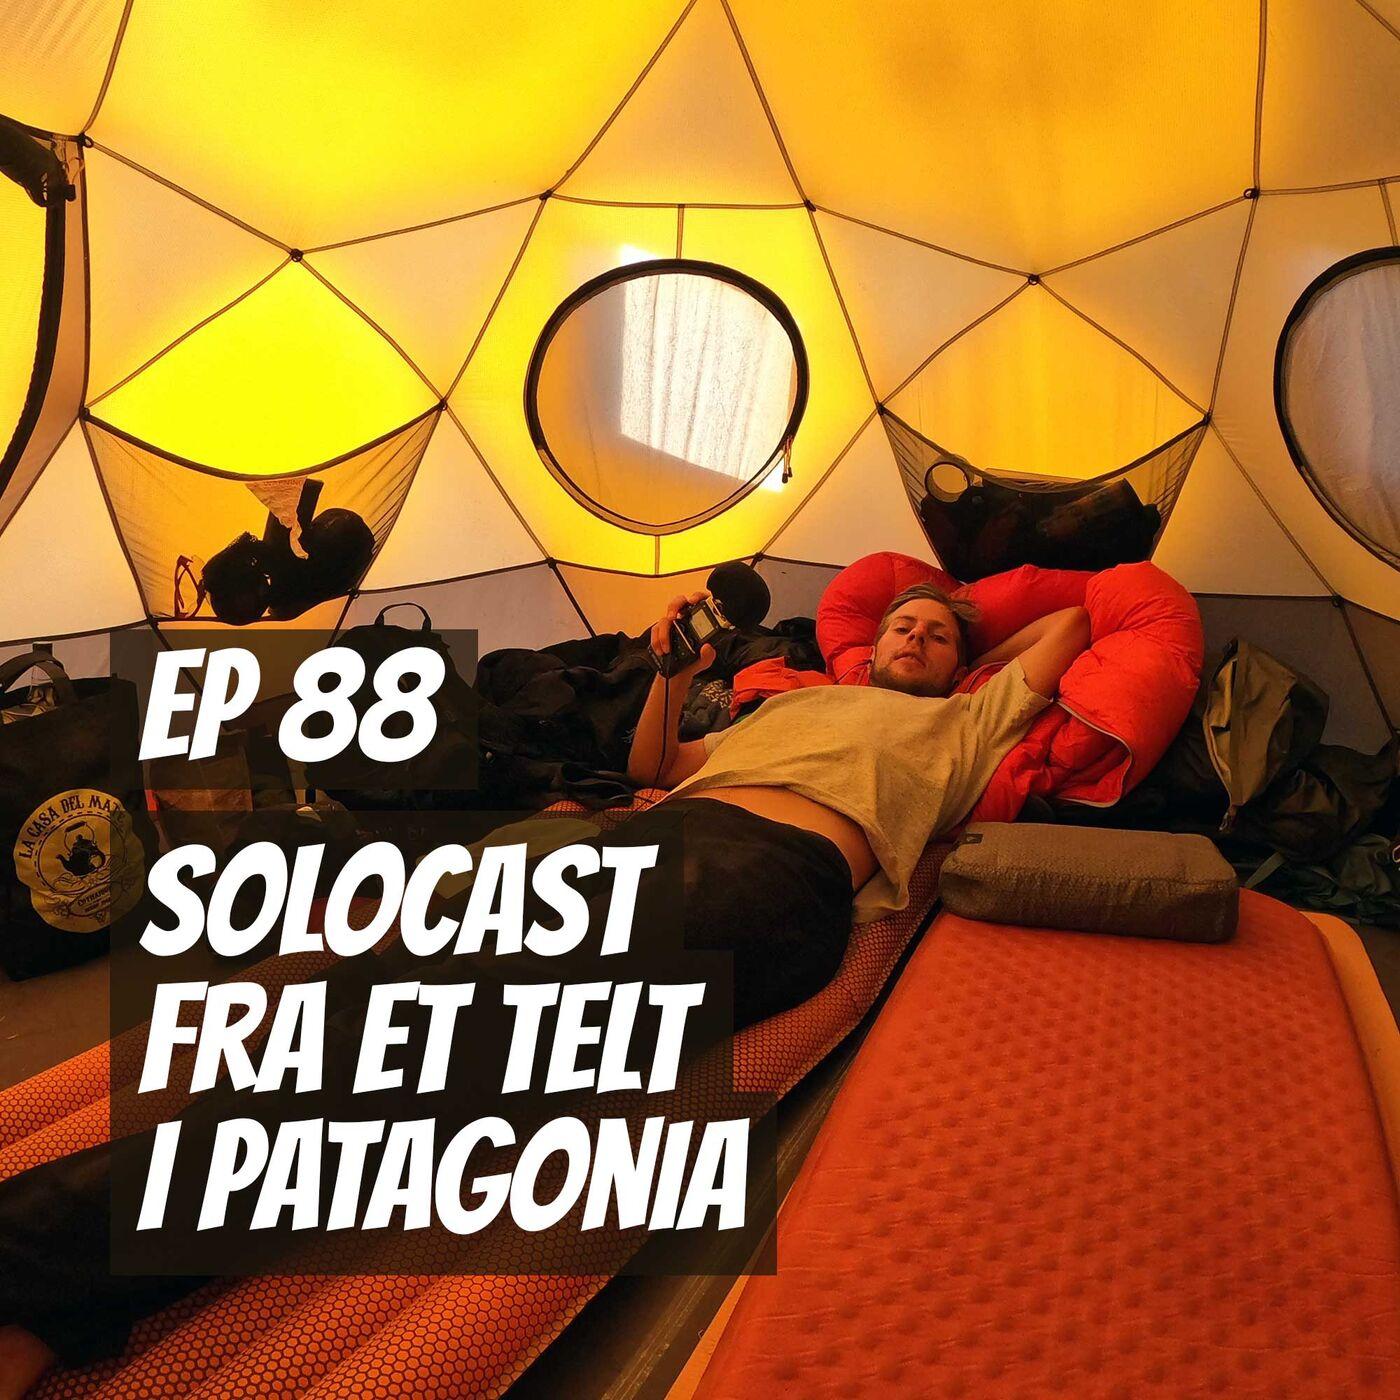 #88 - Solocast fra et telt i Patagonia | Faceplant på Gran Canaria og status fra programlederen i Sør-Amerika